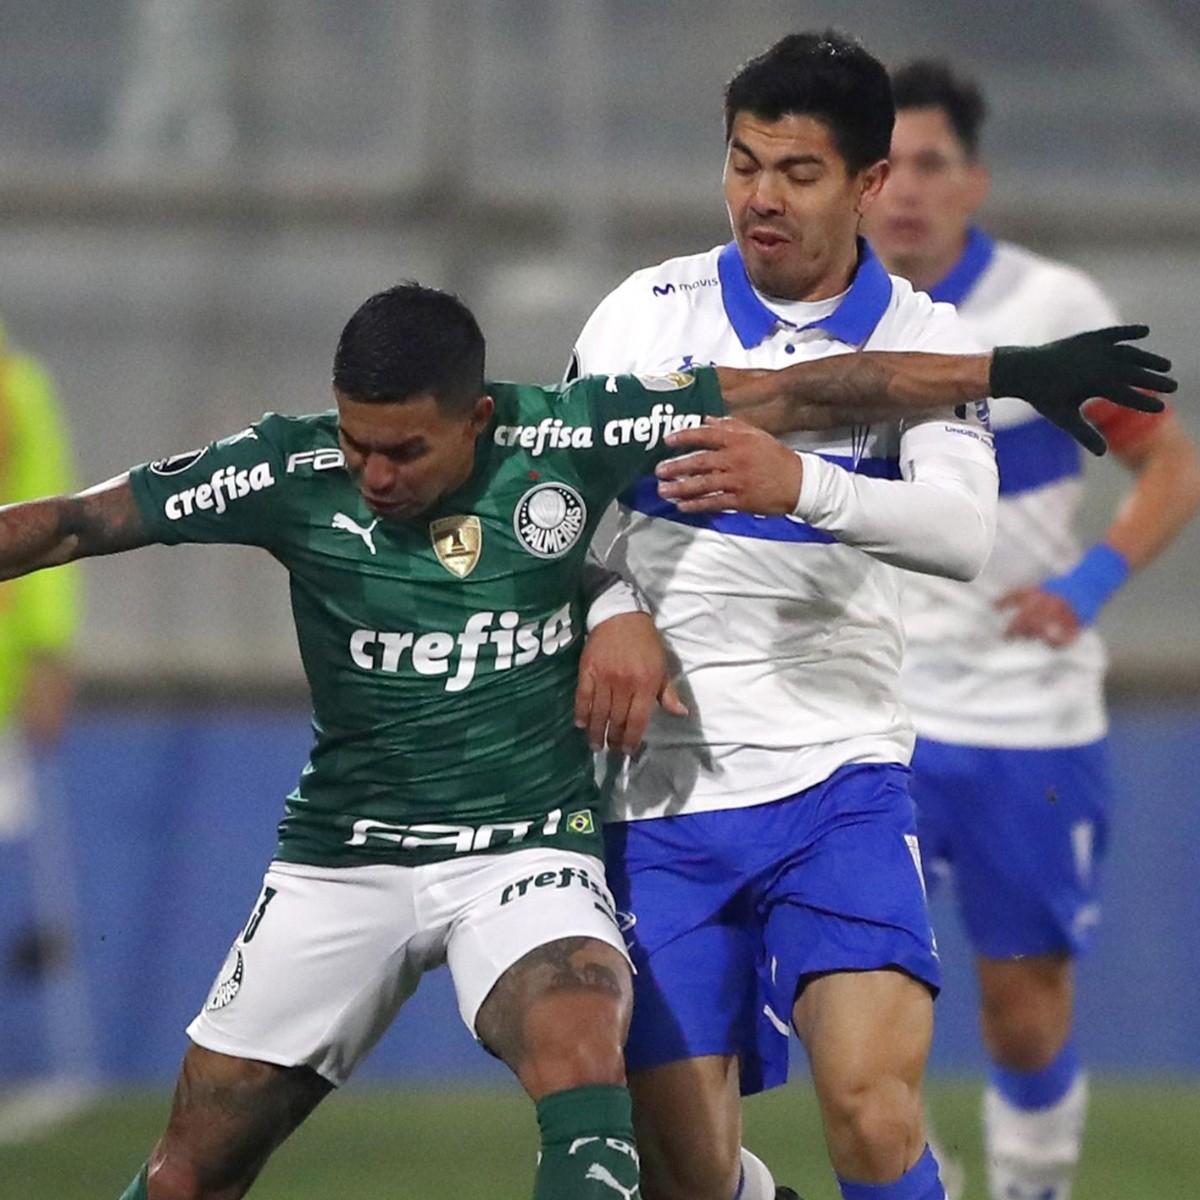 Copa Libertadores: Universidad Católica pierde con Palmeiras y llega condicionado para enfrentar a Colo Colo | Dale Albo